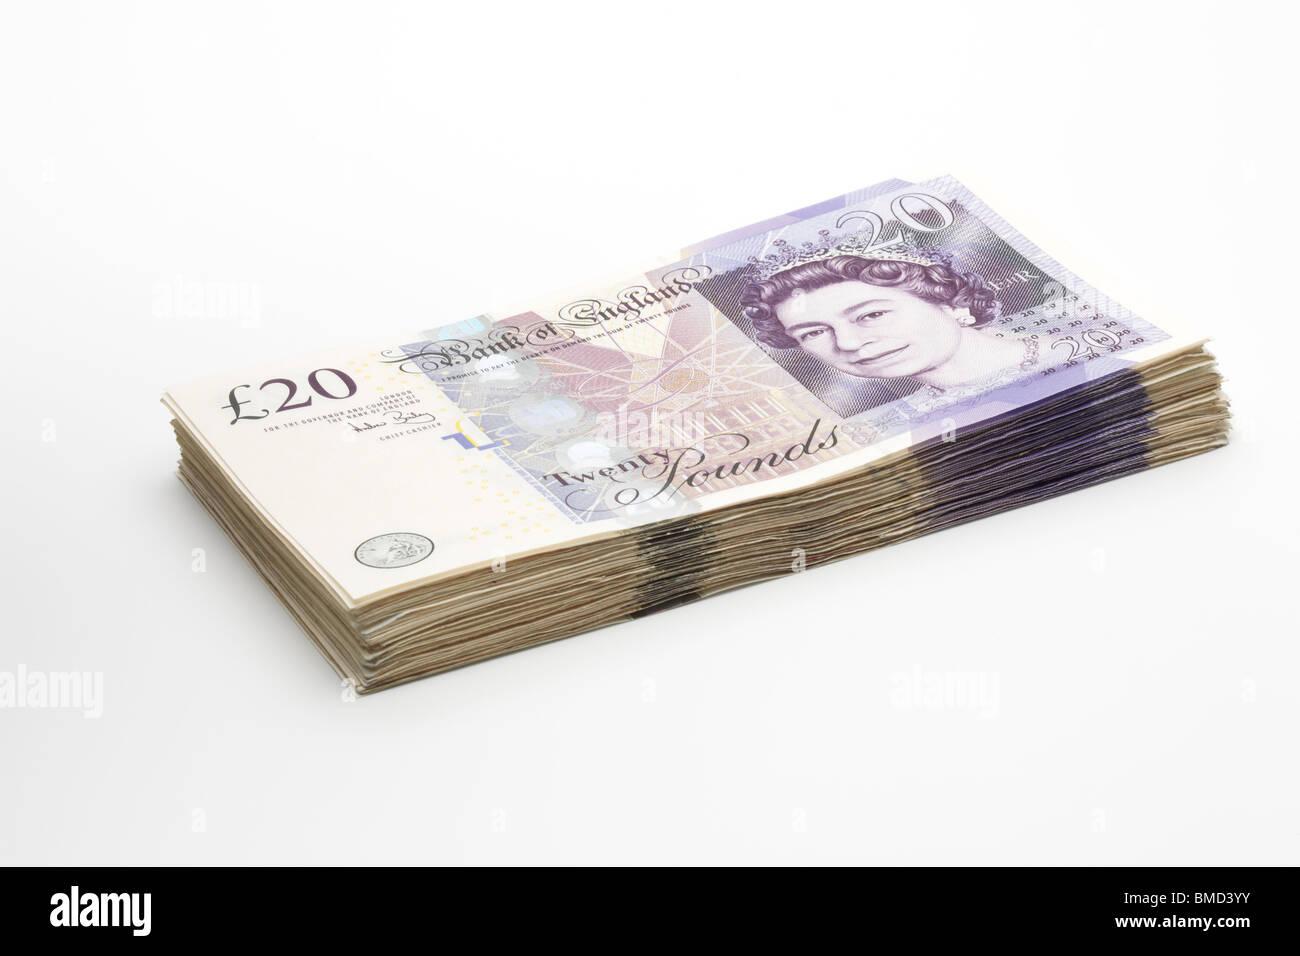 A Stack of Twenty Pound Notes - Stock Image